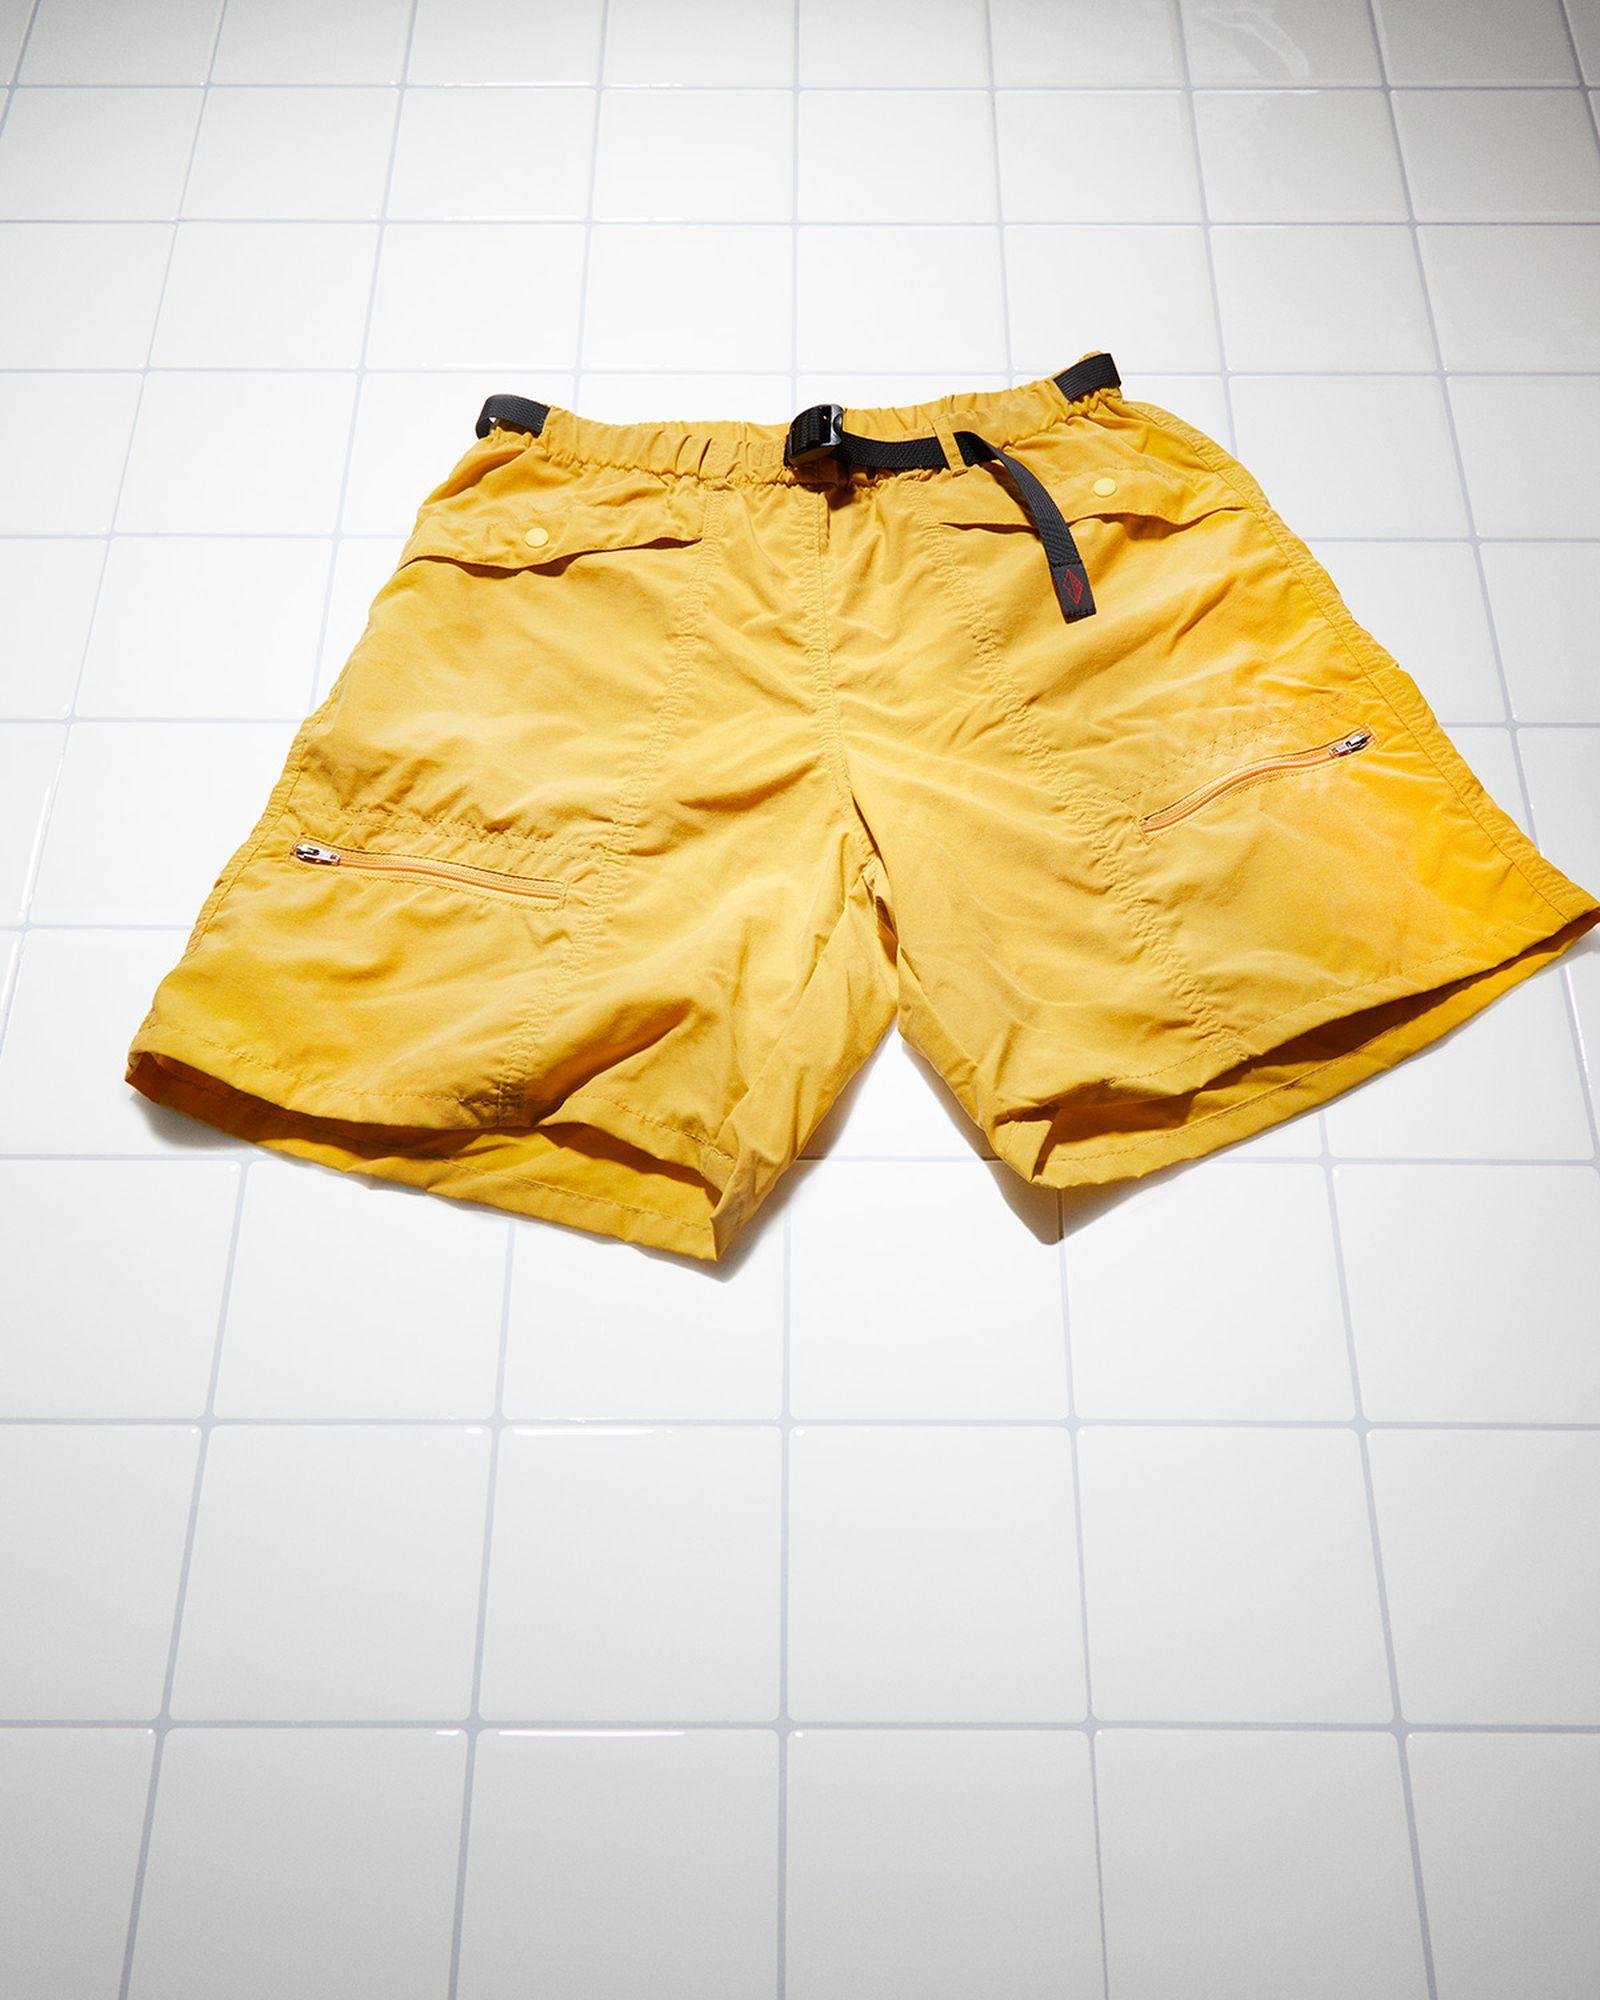 200519_ED_GearTest_Shorts_Jason_Pietra_01yellow5x4